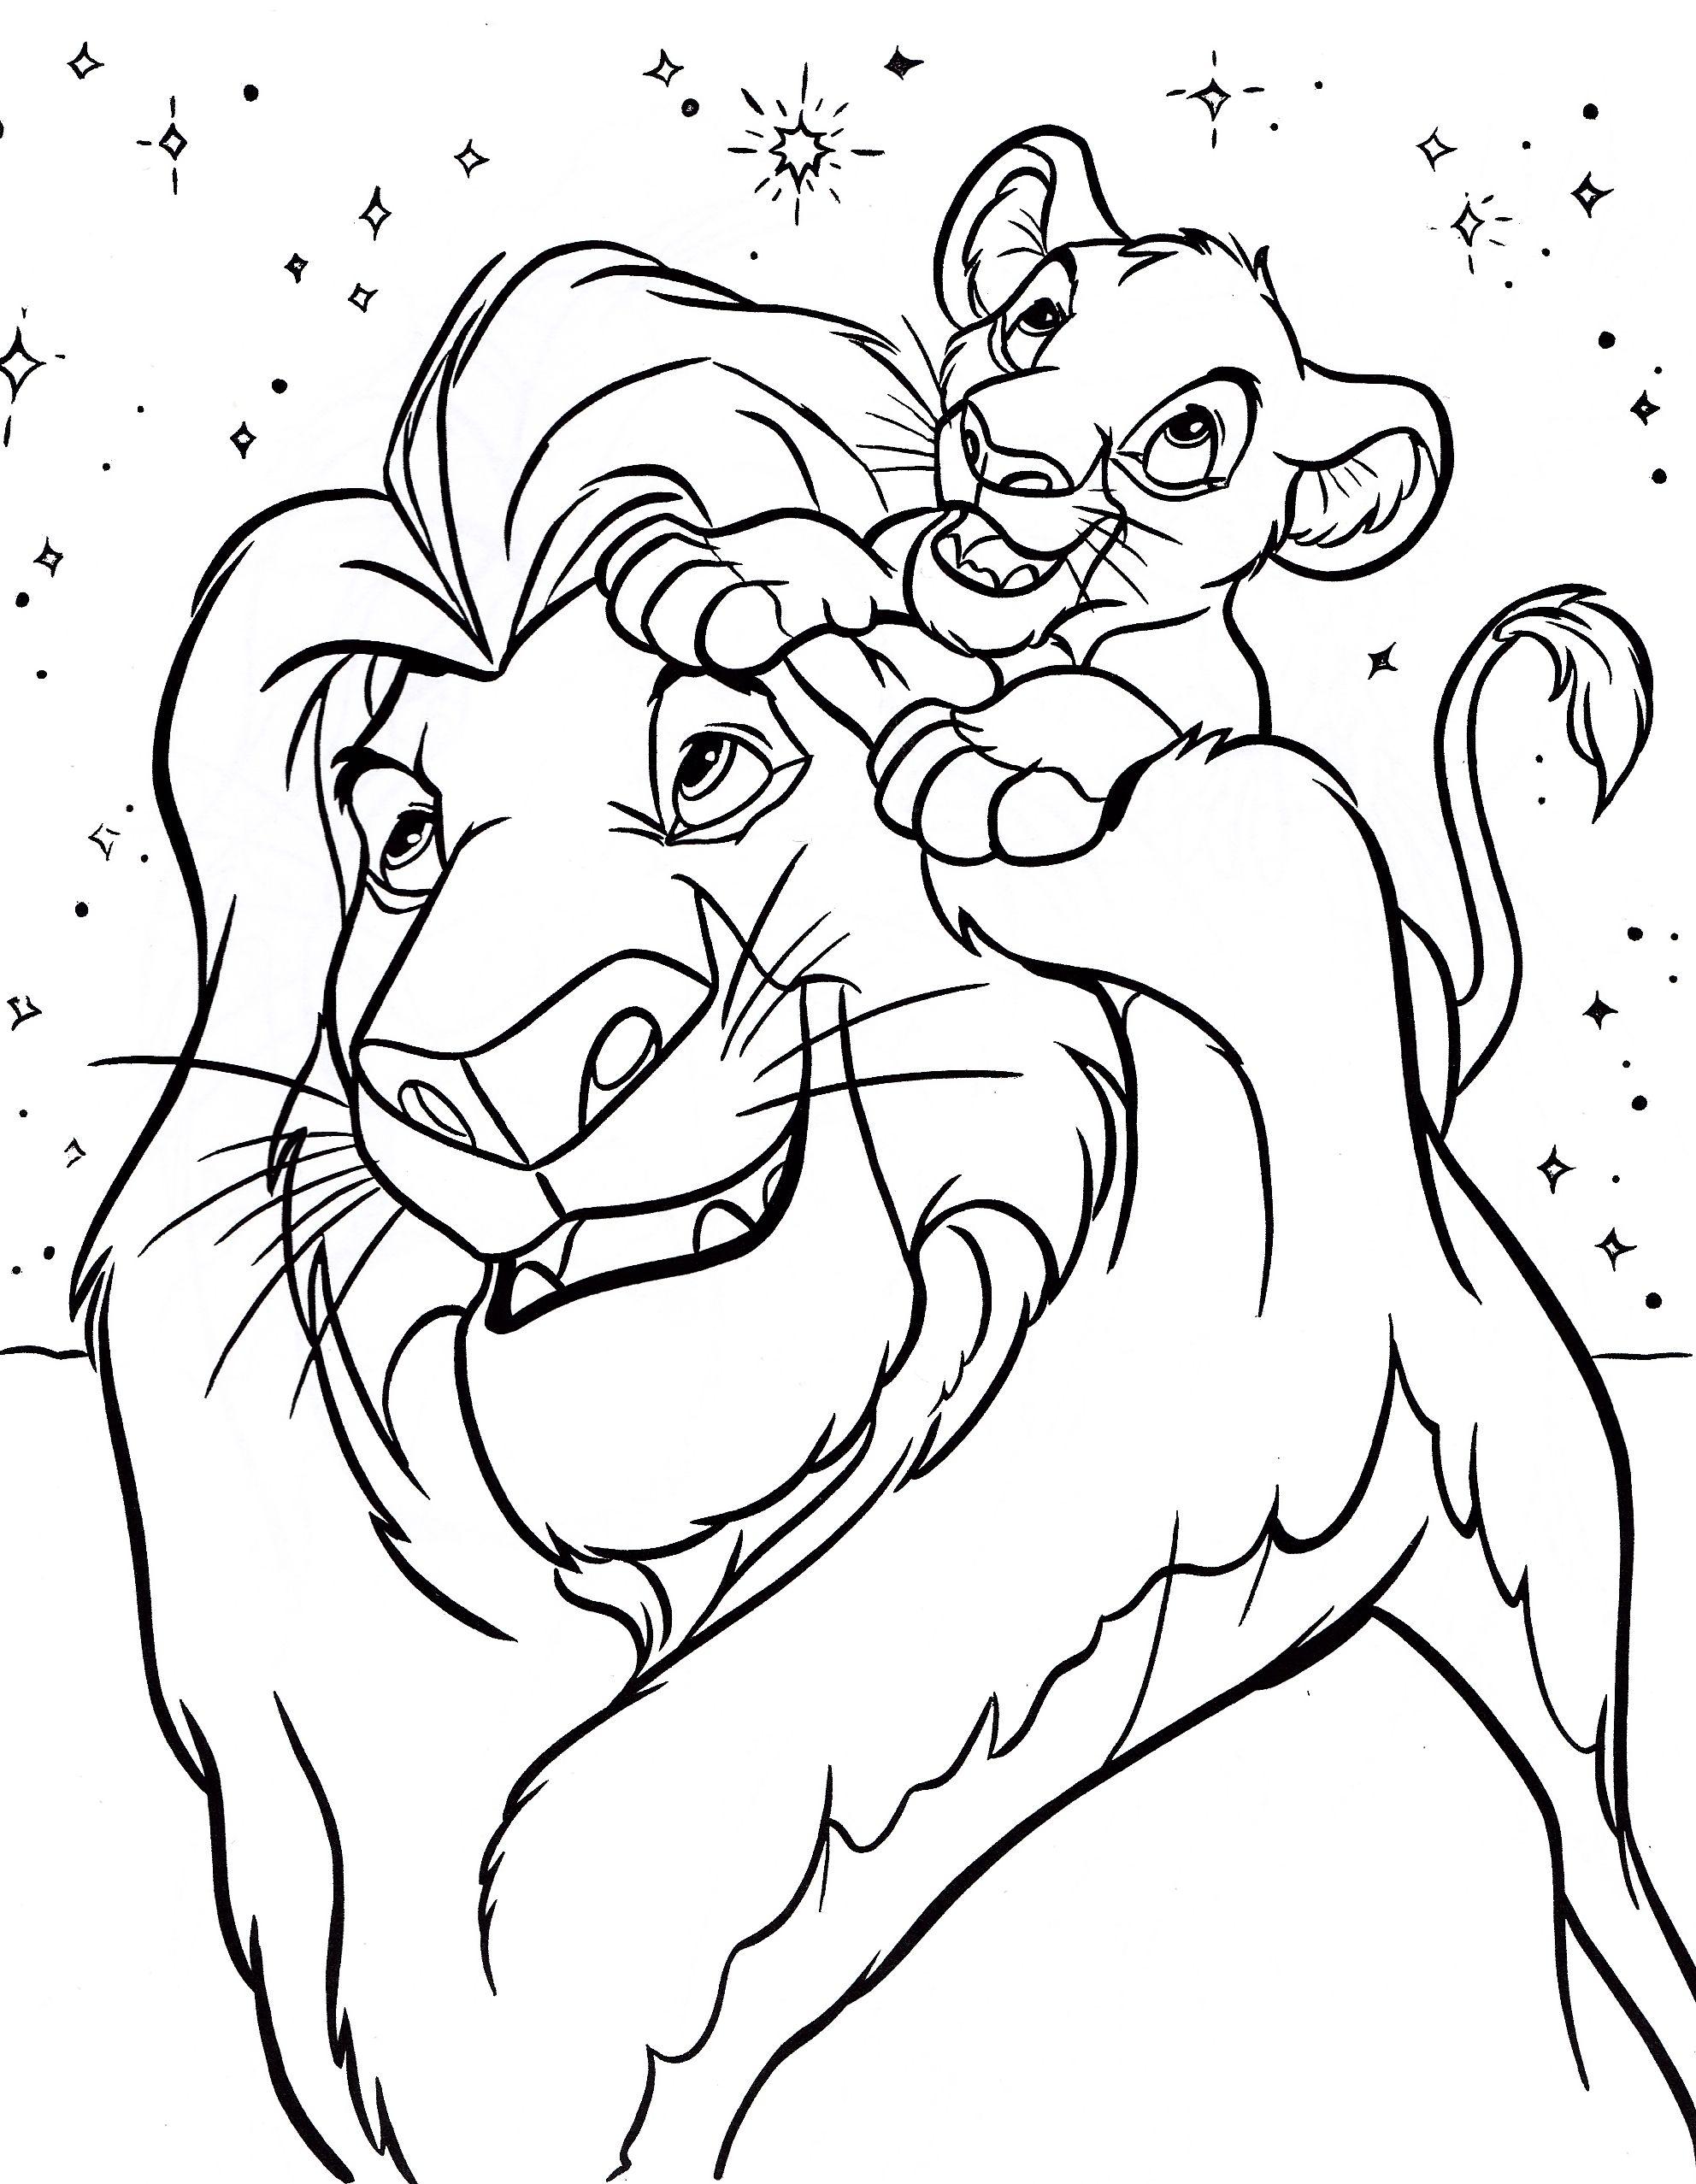 Walt Disney Coloring Sheets | Coloring Pages | Pinterest